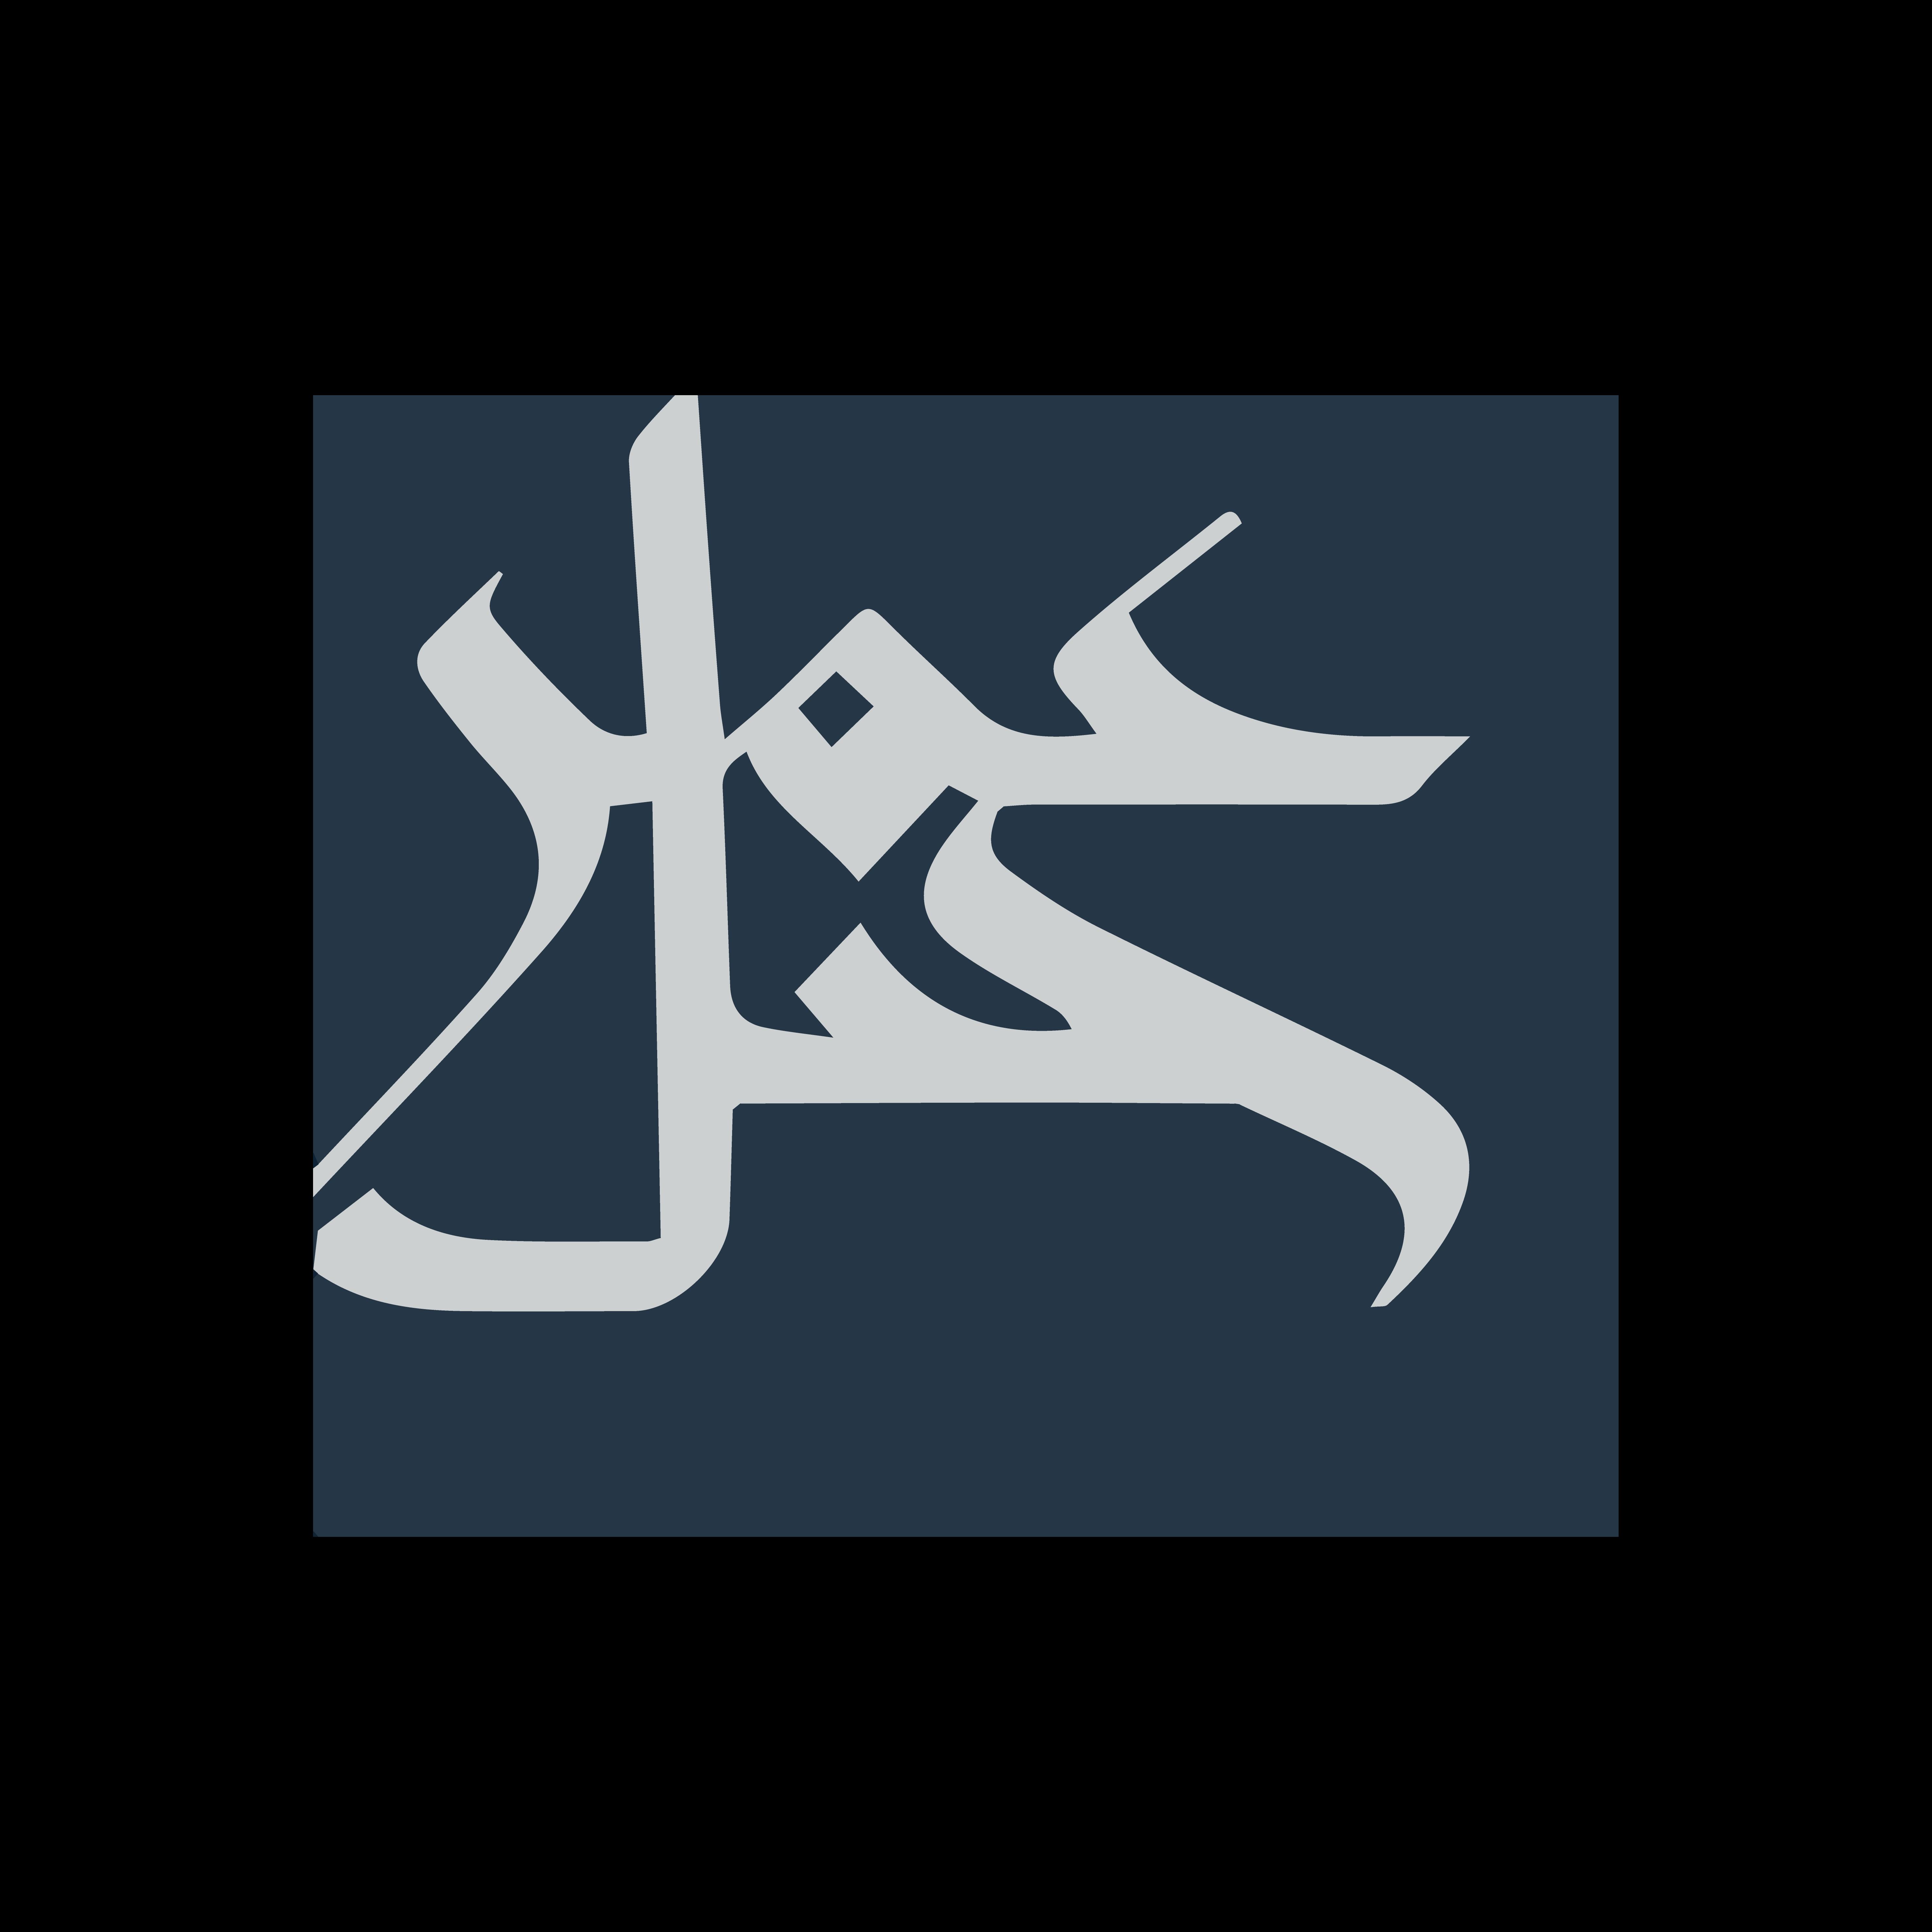 nawatt_clients_logos-07